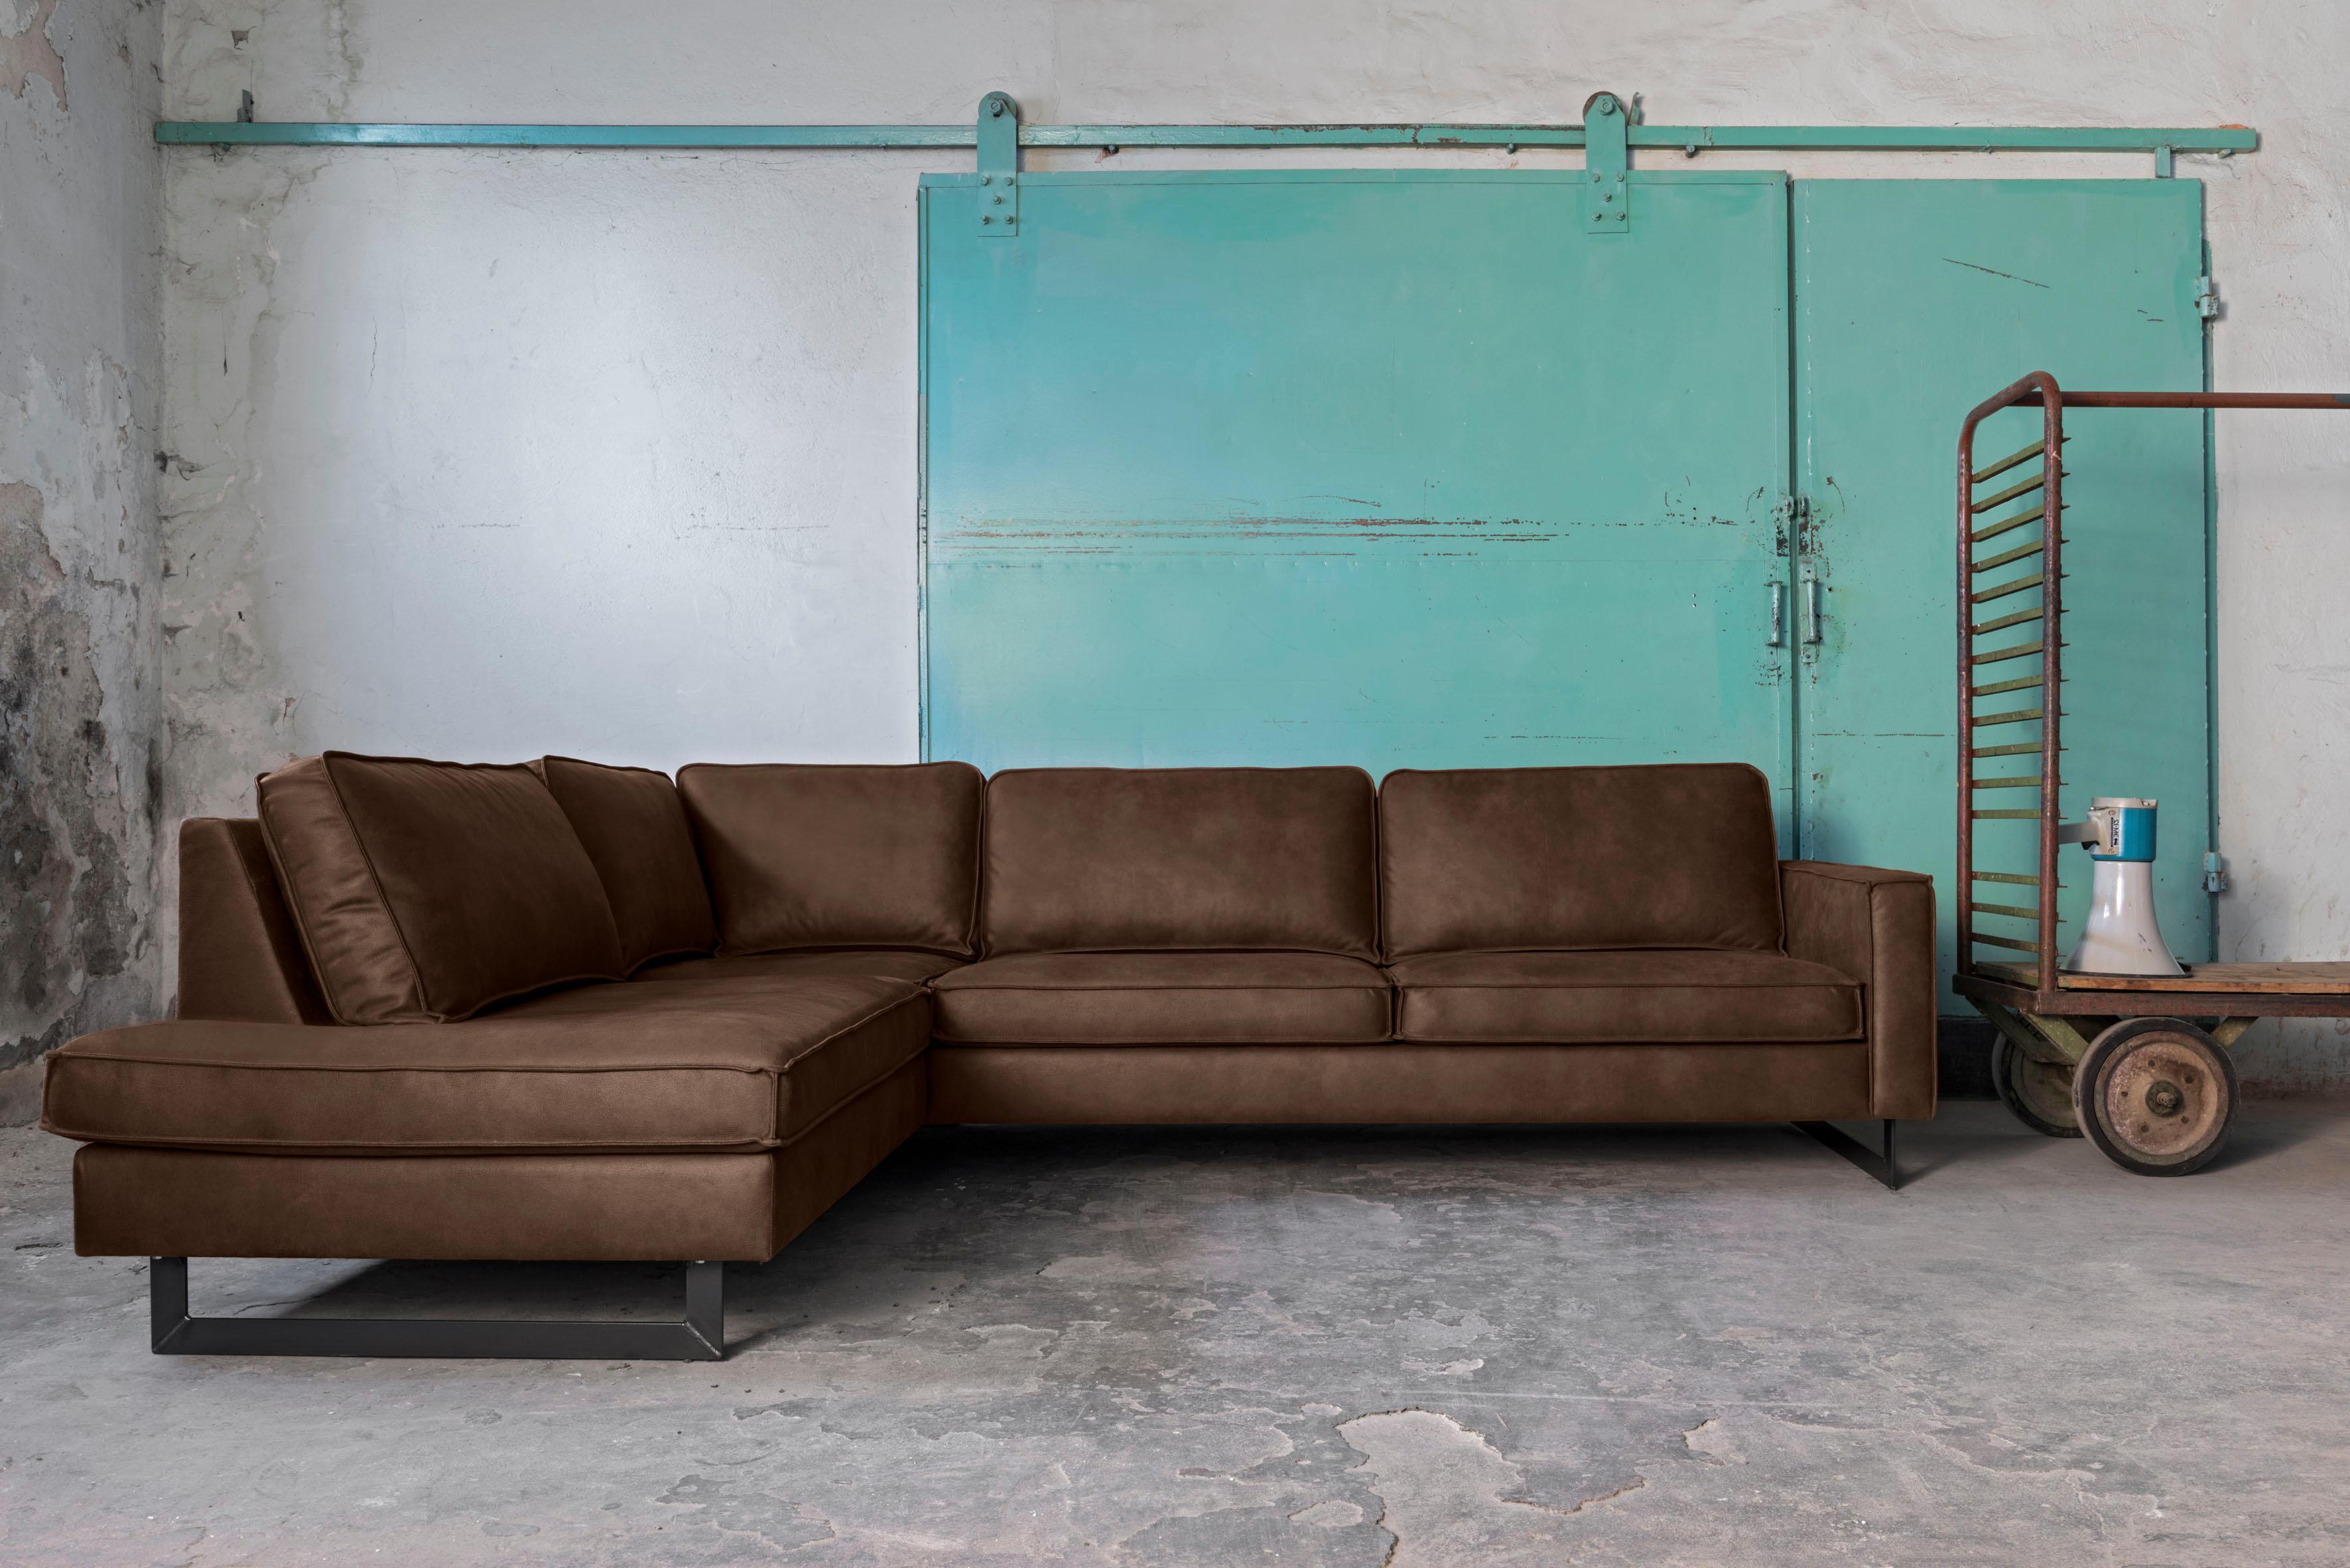 Places of Style Ecksofa »Pinto« mit Keder und Metallfüßen